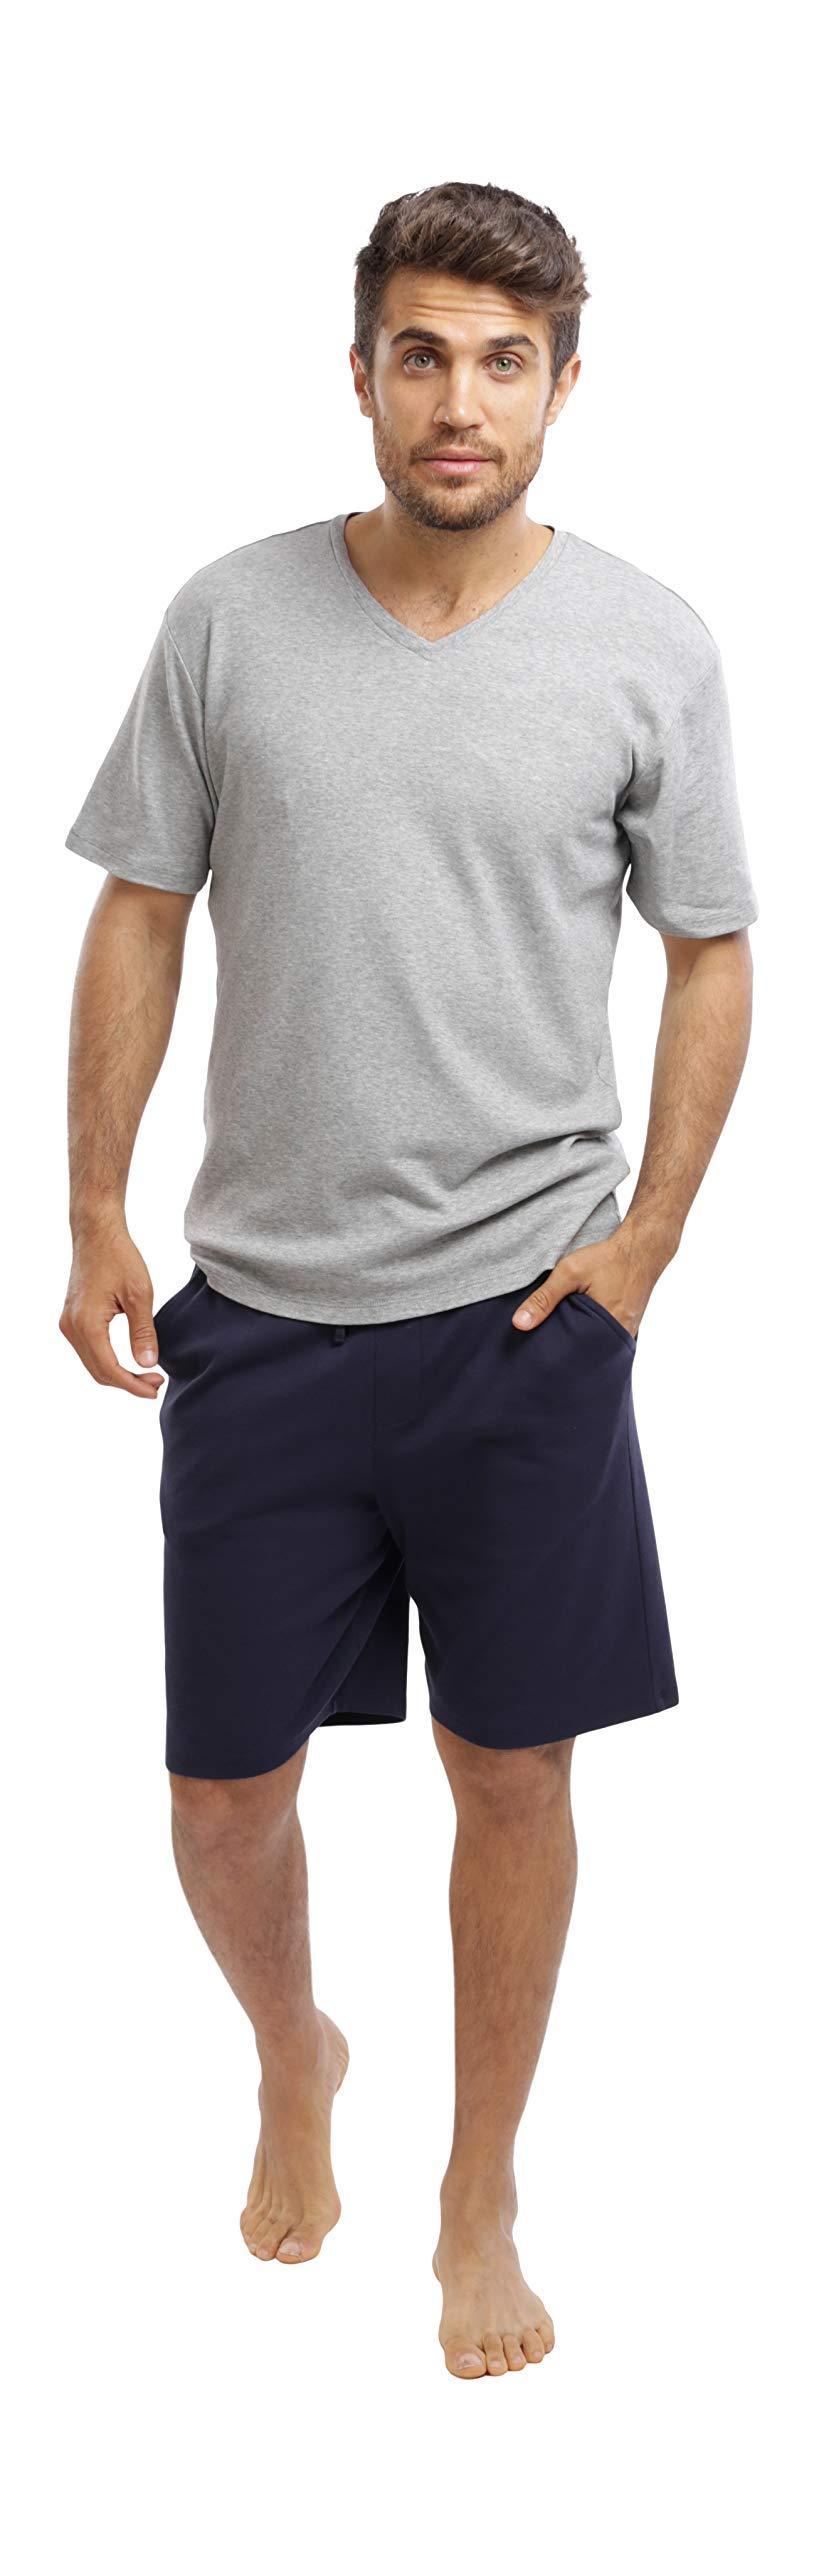 jijamas Incredibly Soft Pima Cotton Men's Pajamas Set - The Weekender Shorts in Navy and Heather Grey by jijamas (Image #5)